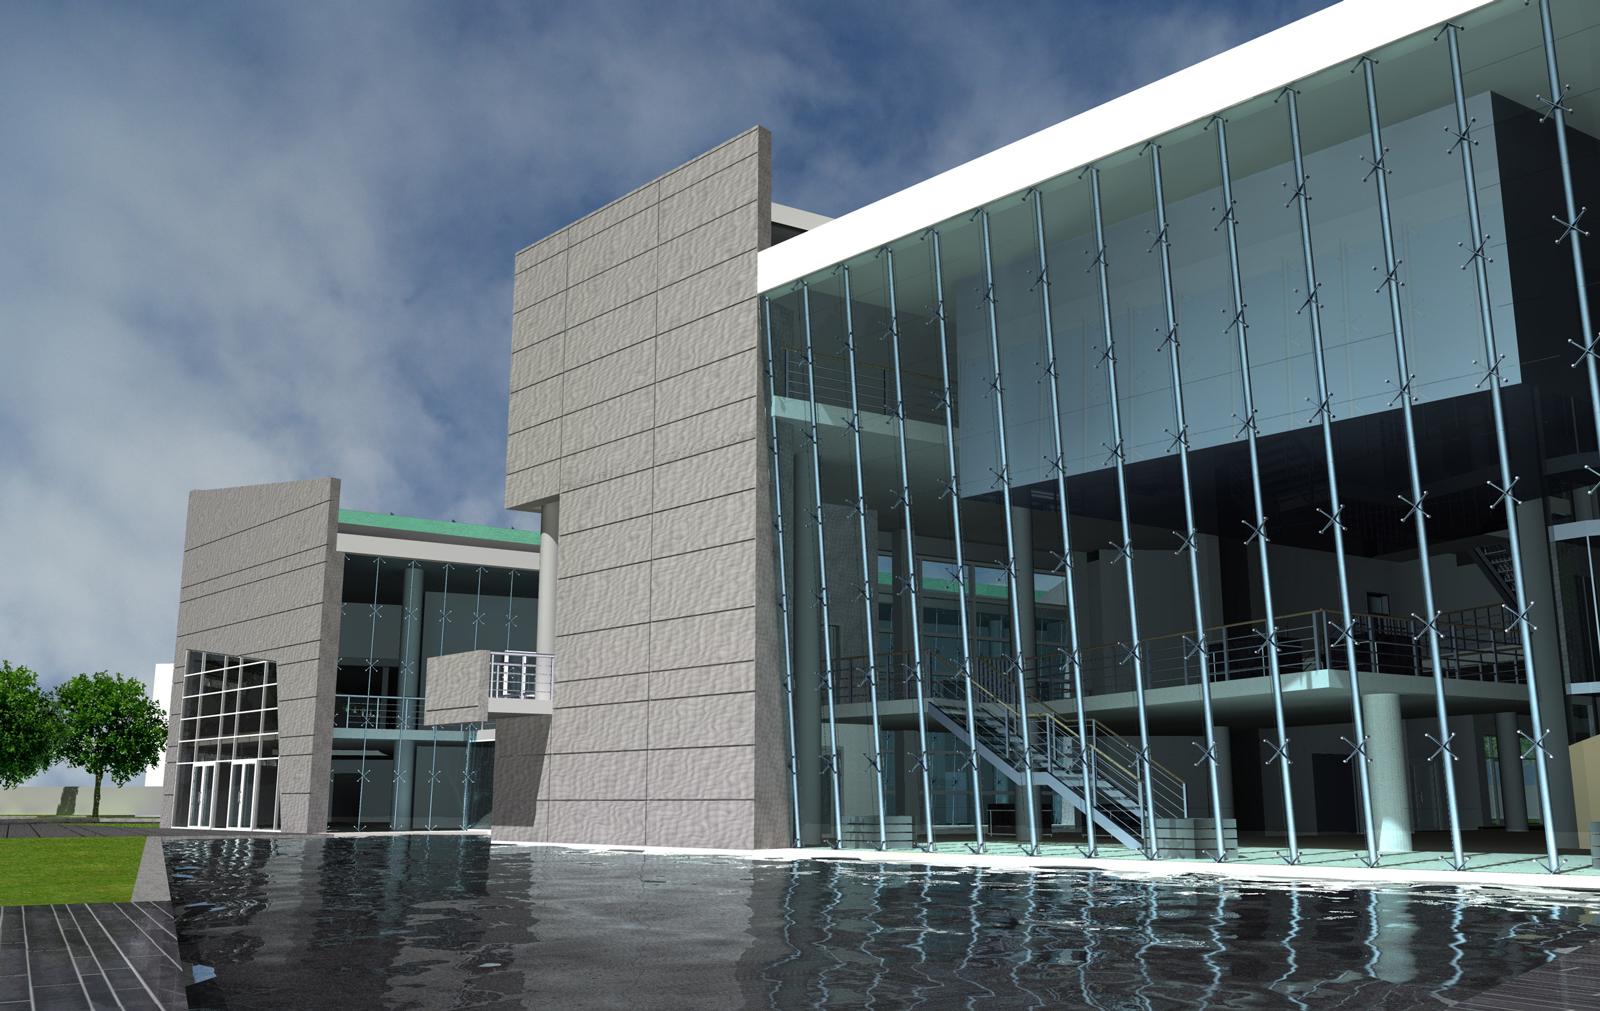 Centro Direzionale AMA S.p.A. (2005) - Veduta Ovest